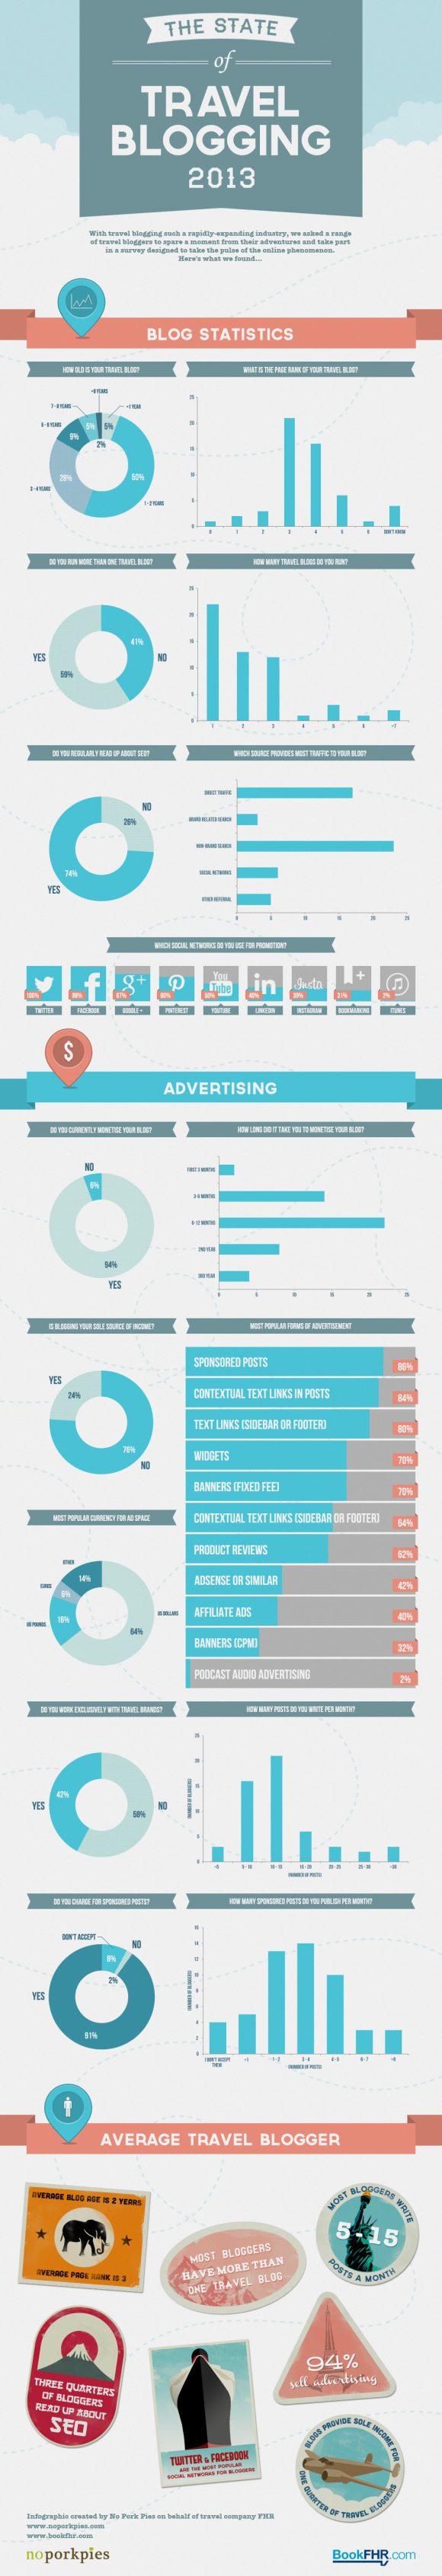 Travel-Blogging-2013-Infographic